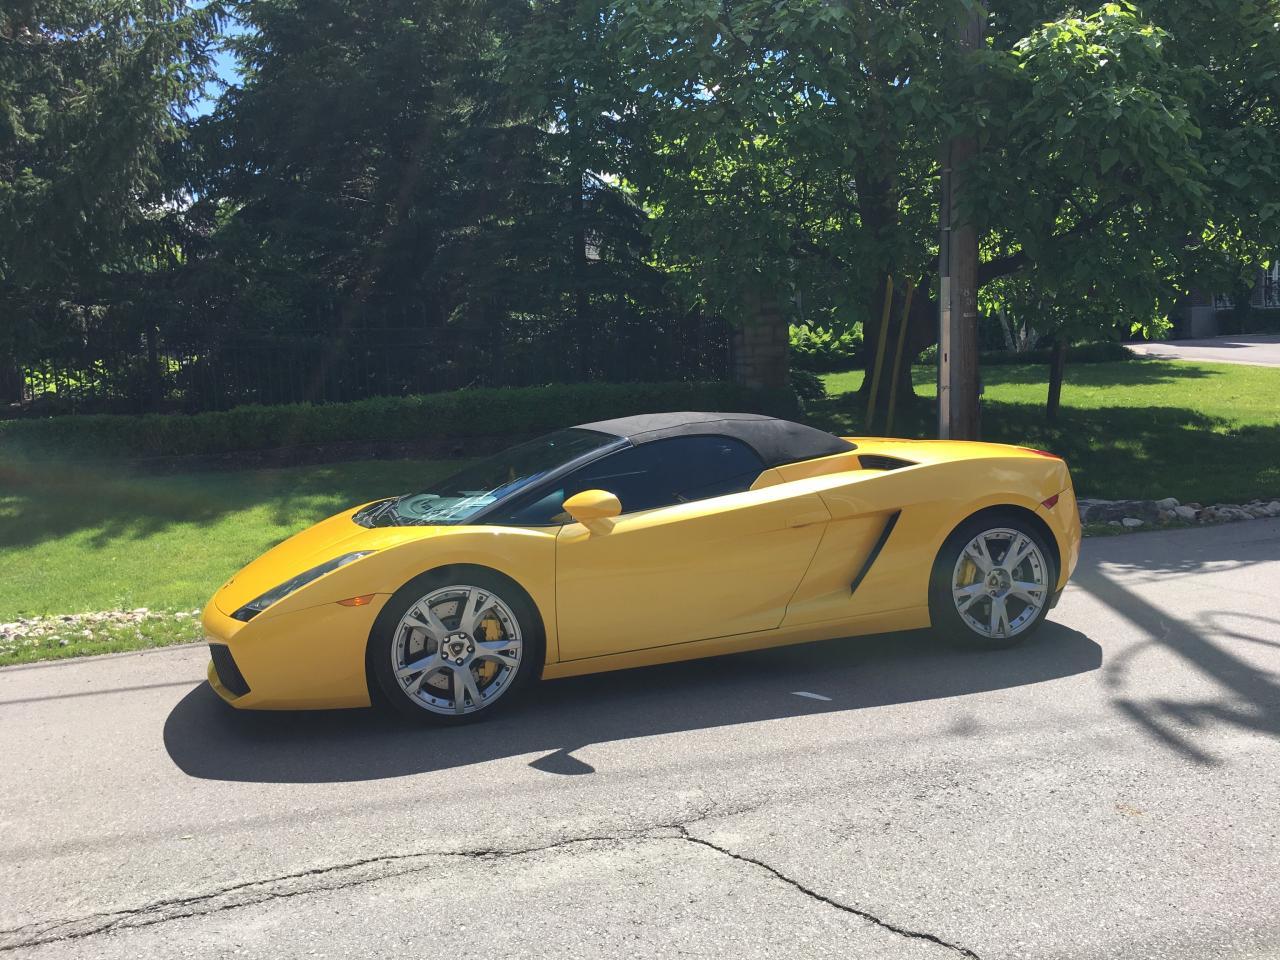 Photo of Yellow 2007 Lamborghini Gallardo